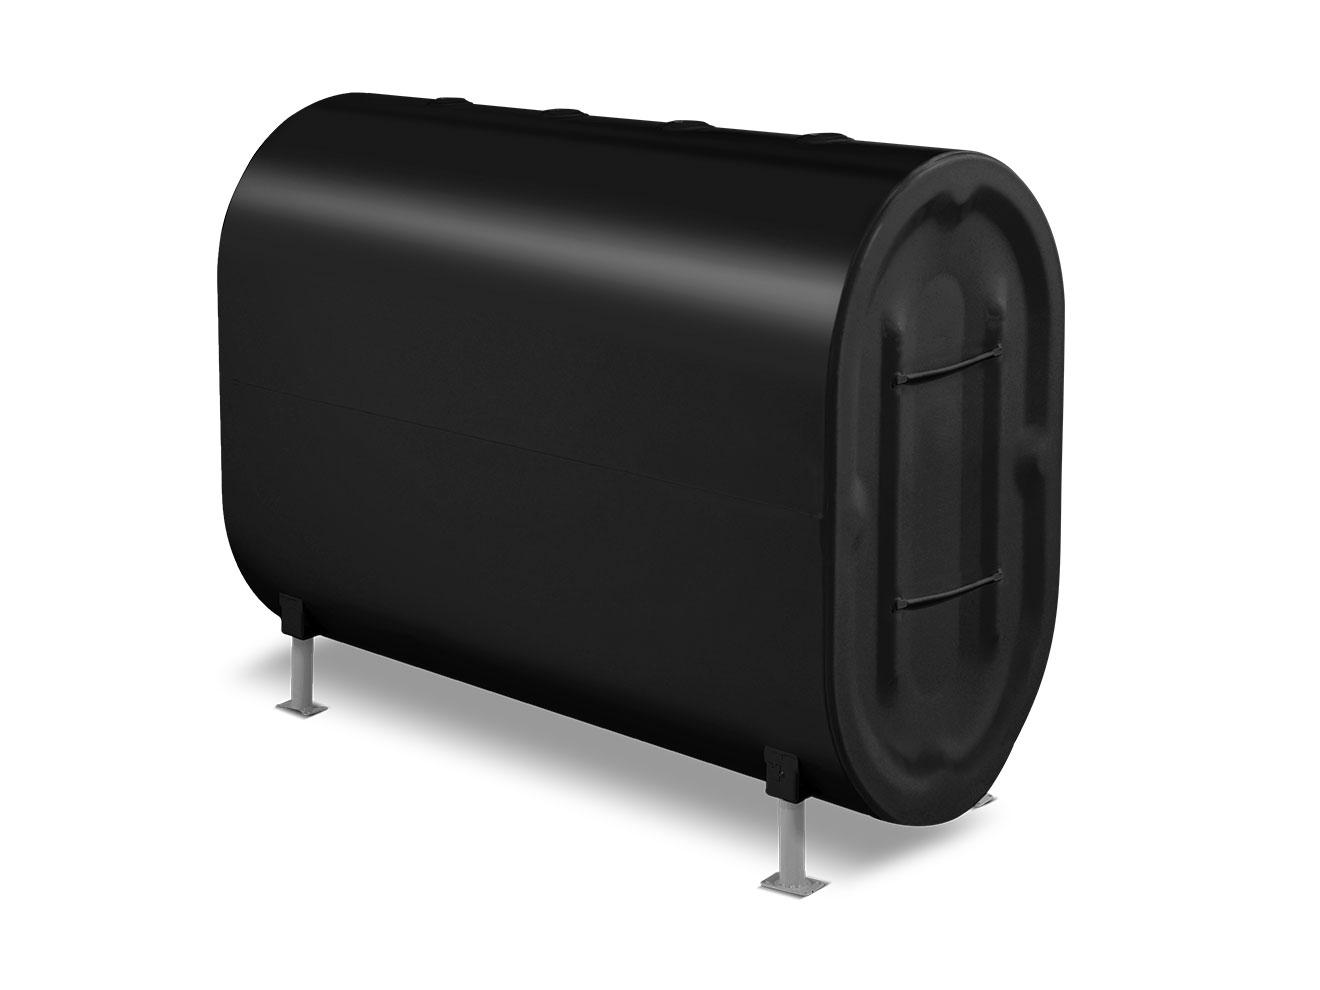 Standard Oil Tank Granby Industries